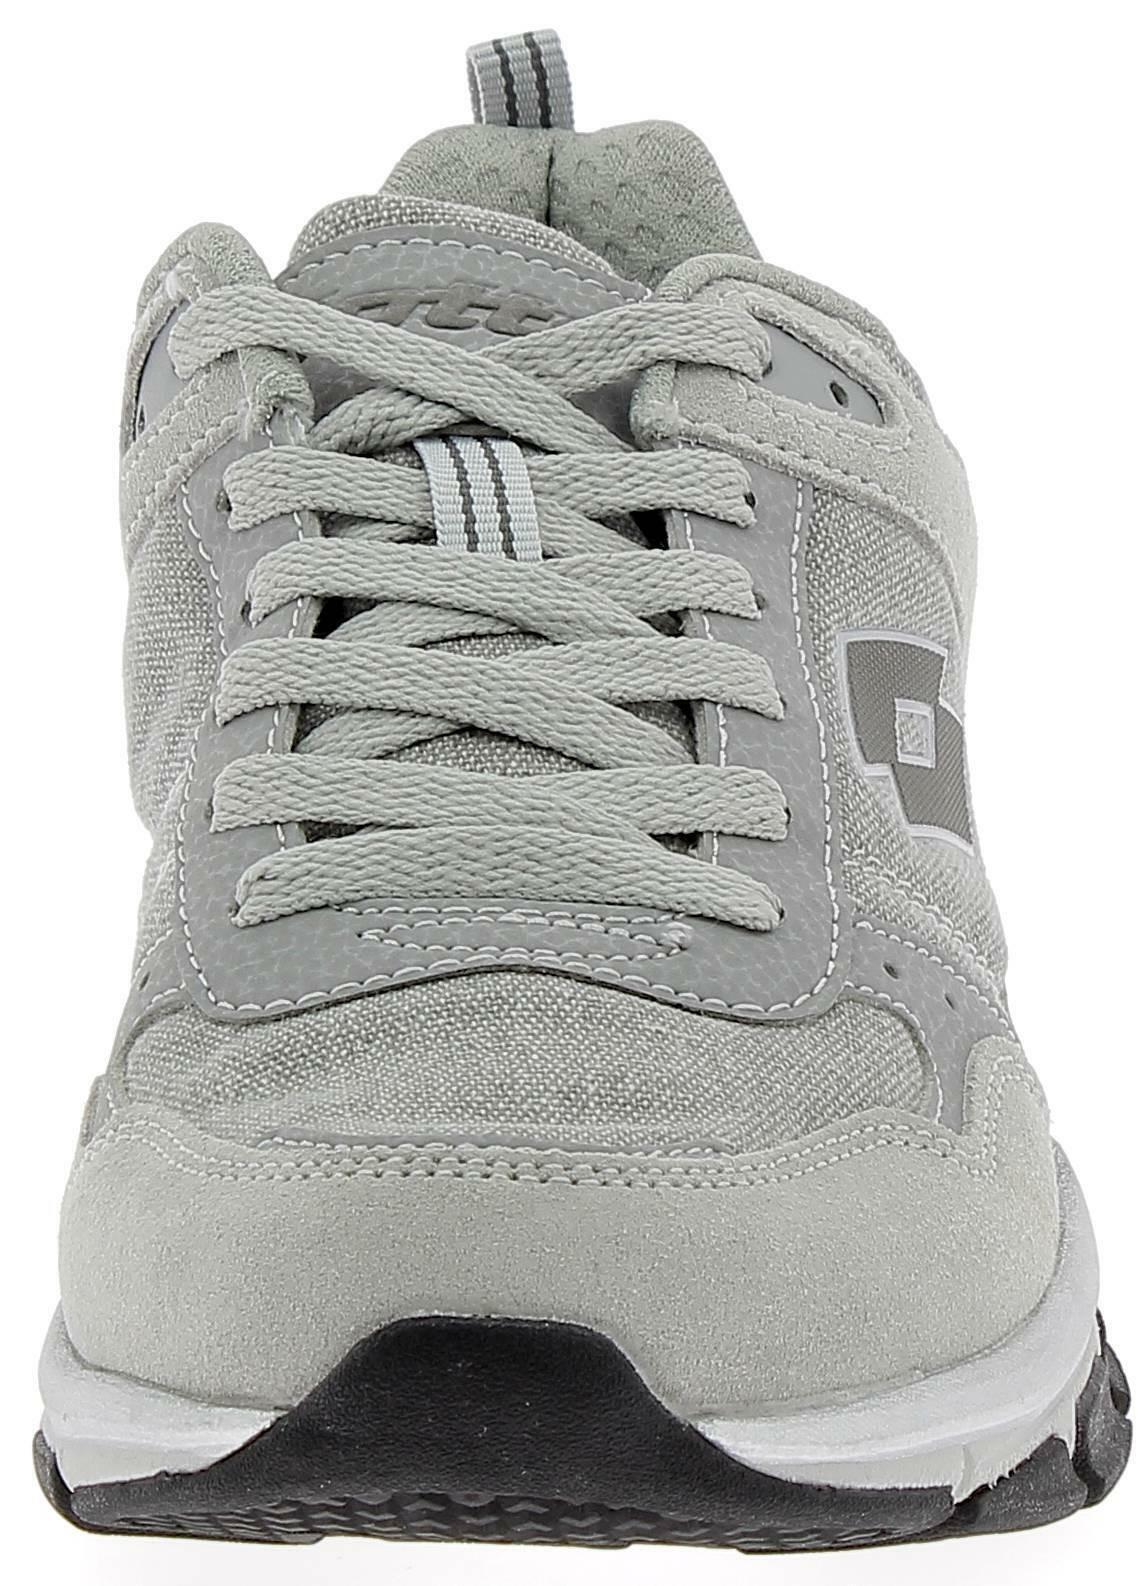 lotto lotto grande iv cvs scarpe sportive uomo grigie